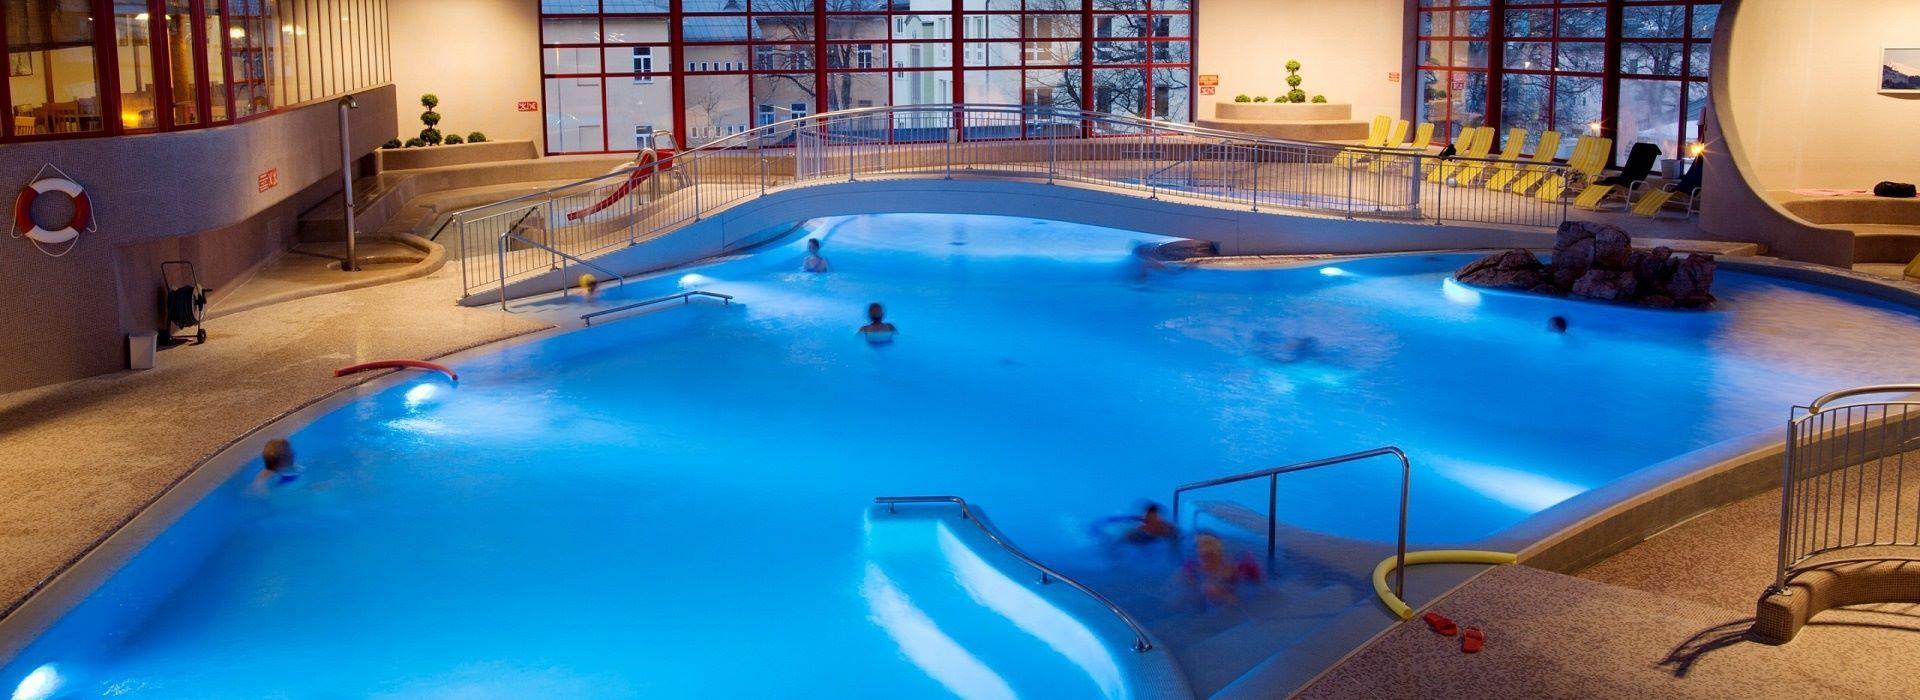 Aquarena Spa : Soho Seafood Restaurants intérieur Piscine Arras Aquarena